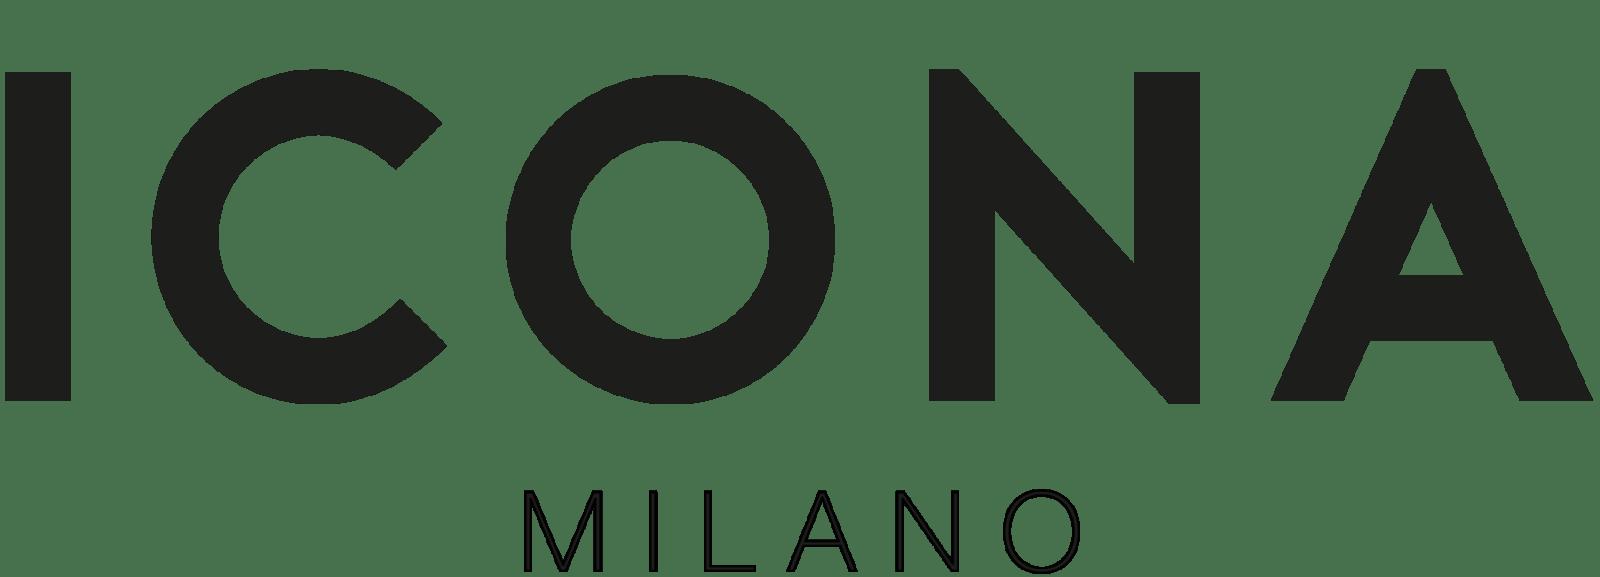 Icona Milano Make-Up